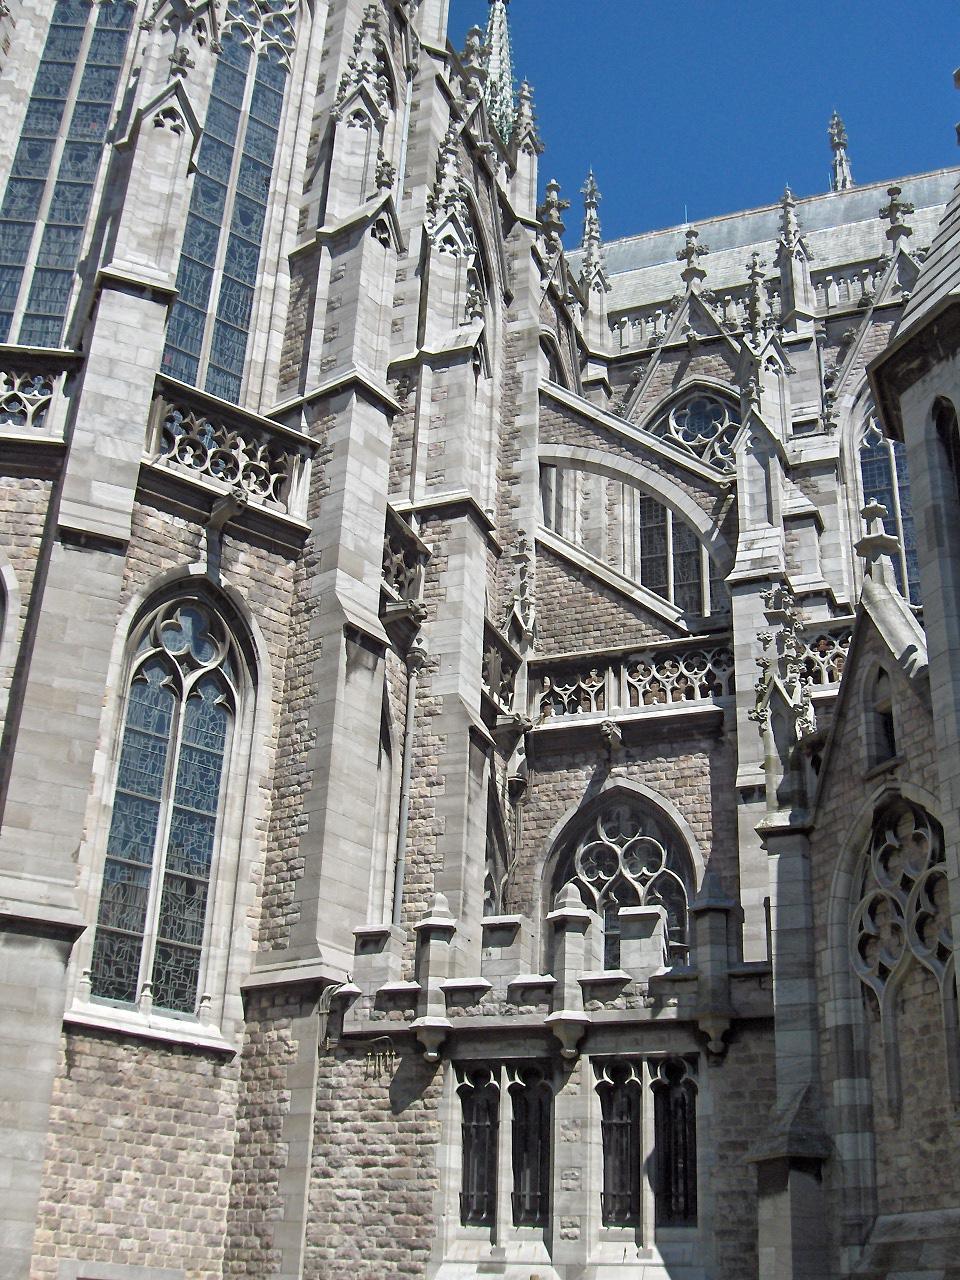 Contrafuertes en la iglesia de San Pedro de Ostend, Bélgica